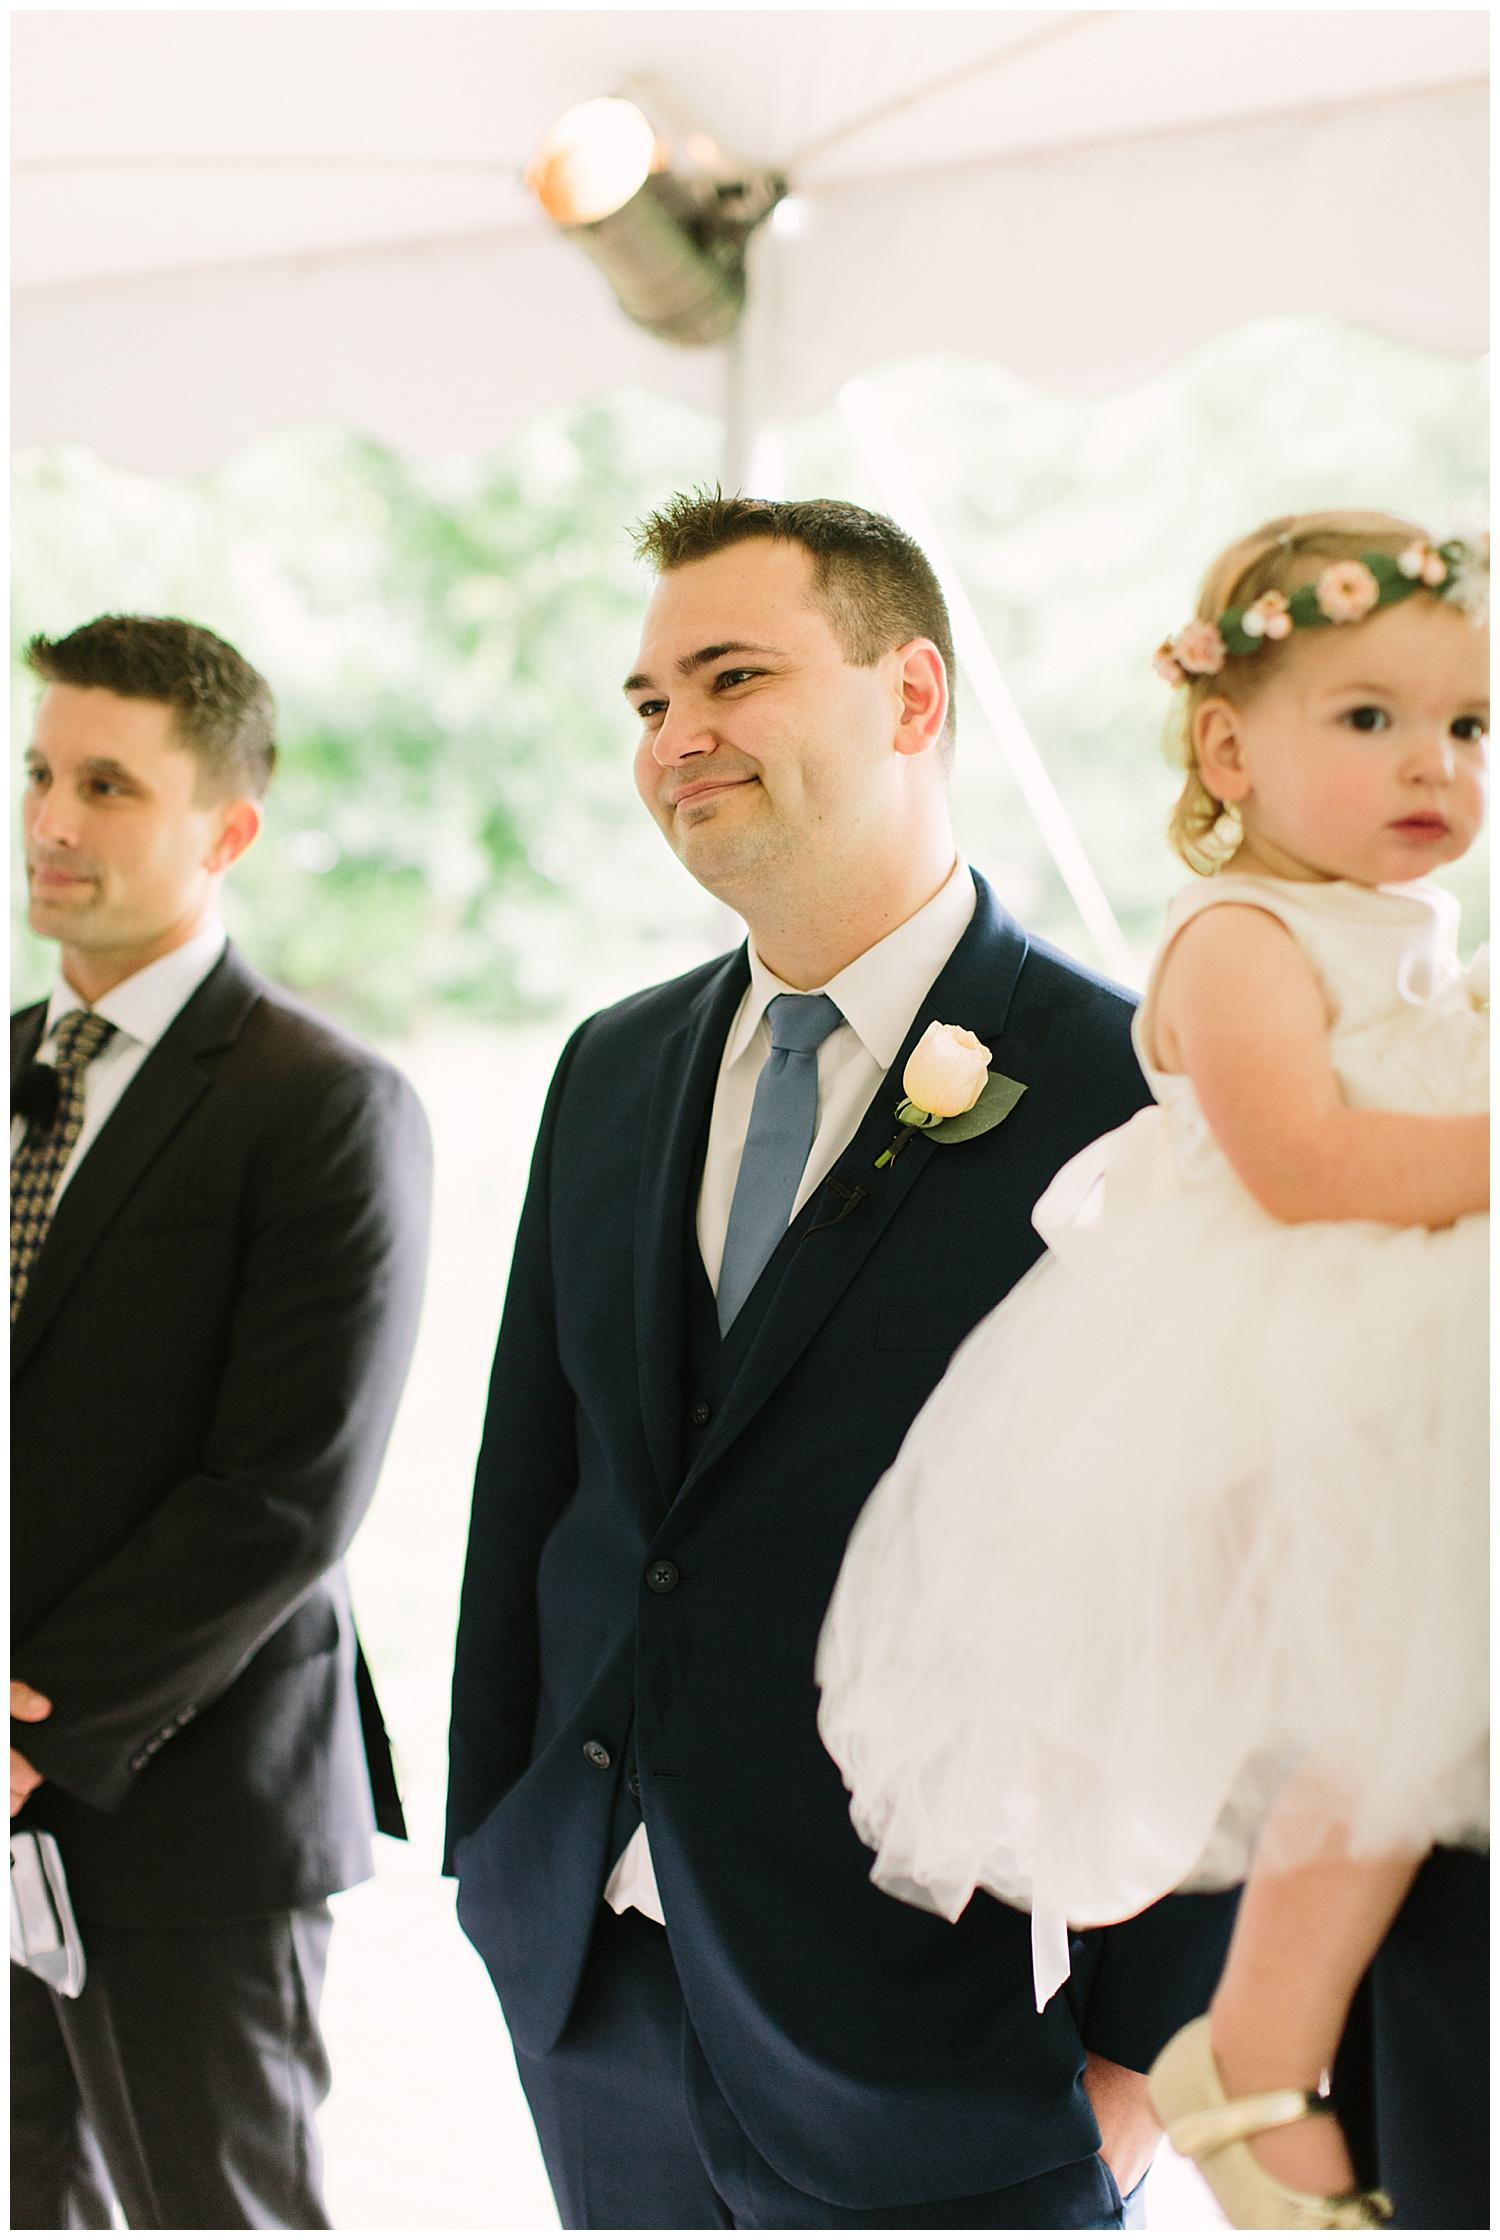 trent.and.kendra.photography.whitehall.wedding-60.jpg